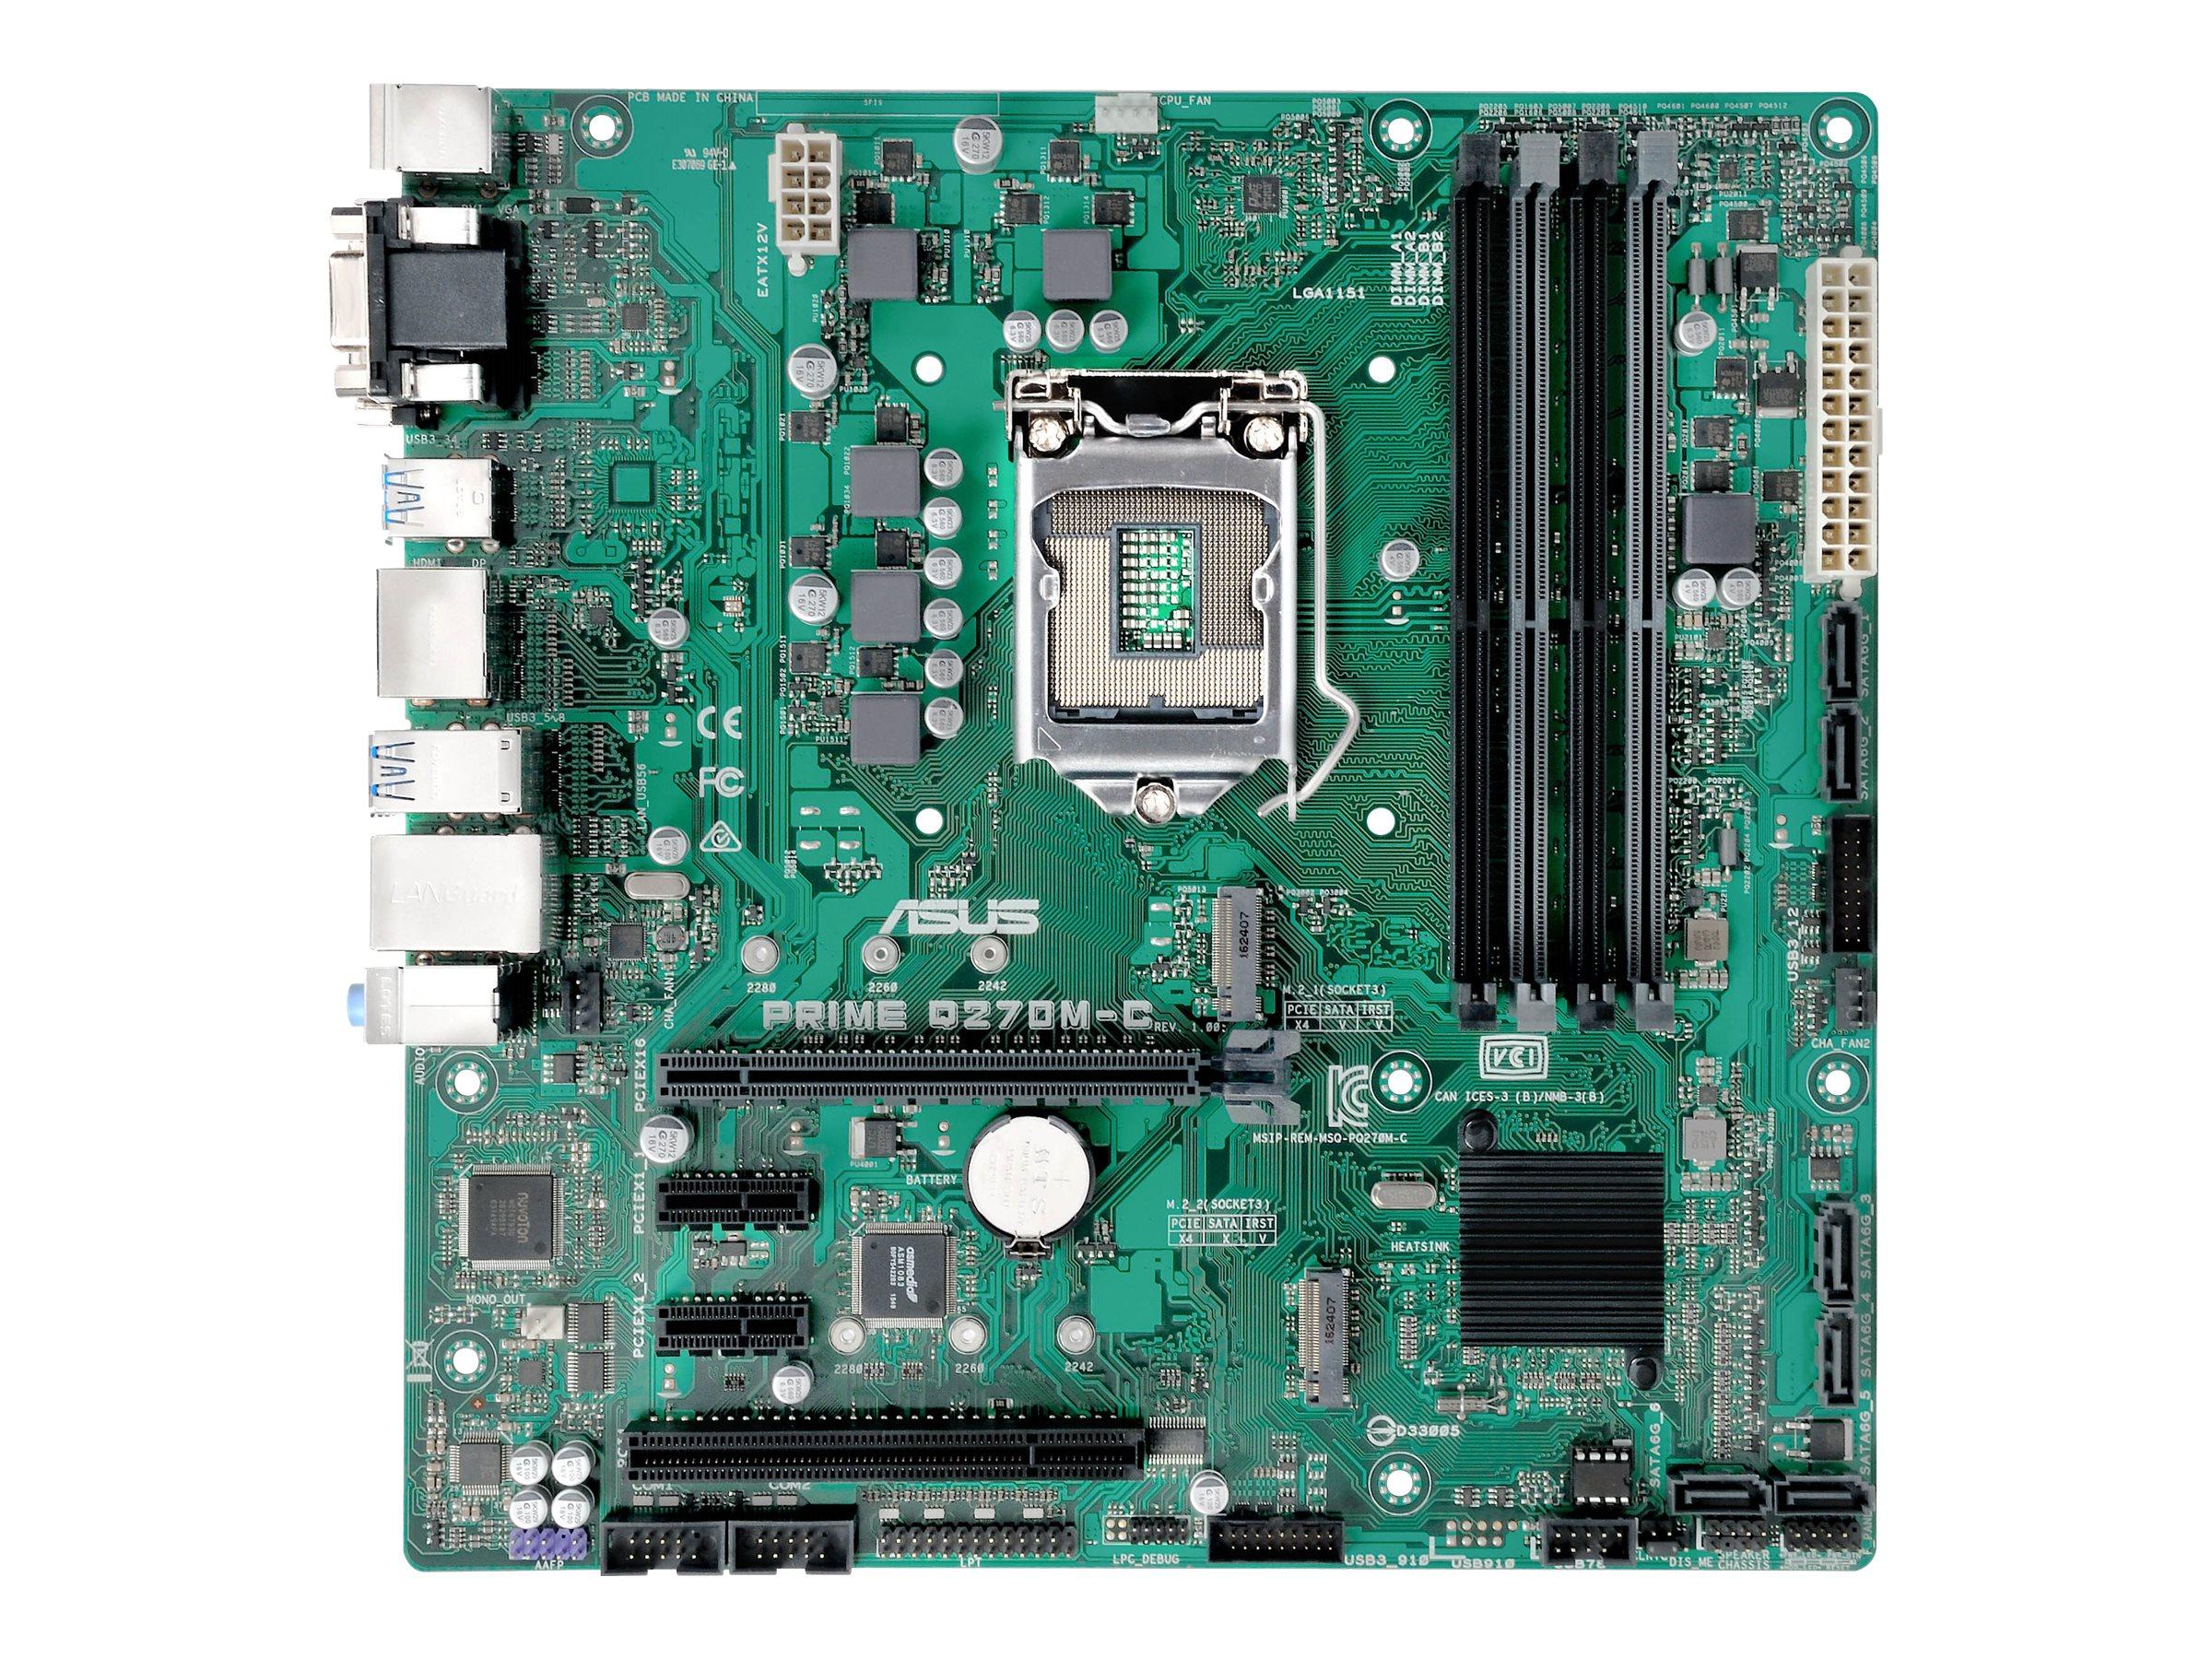 ASUS PRIME Q270M-C/CSM - Motherboard - micro ATX - LGA1151 Socket - Q270 - USB 3.0